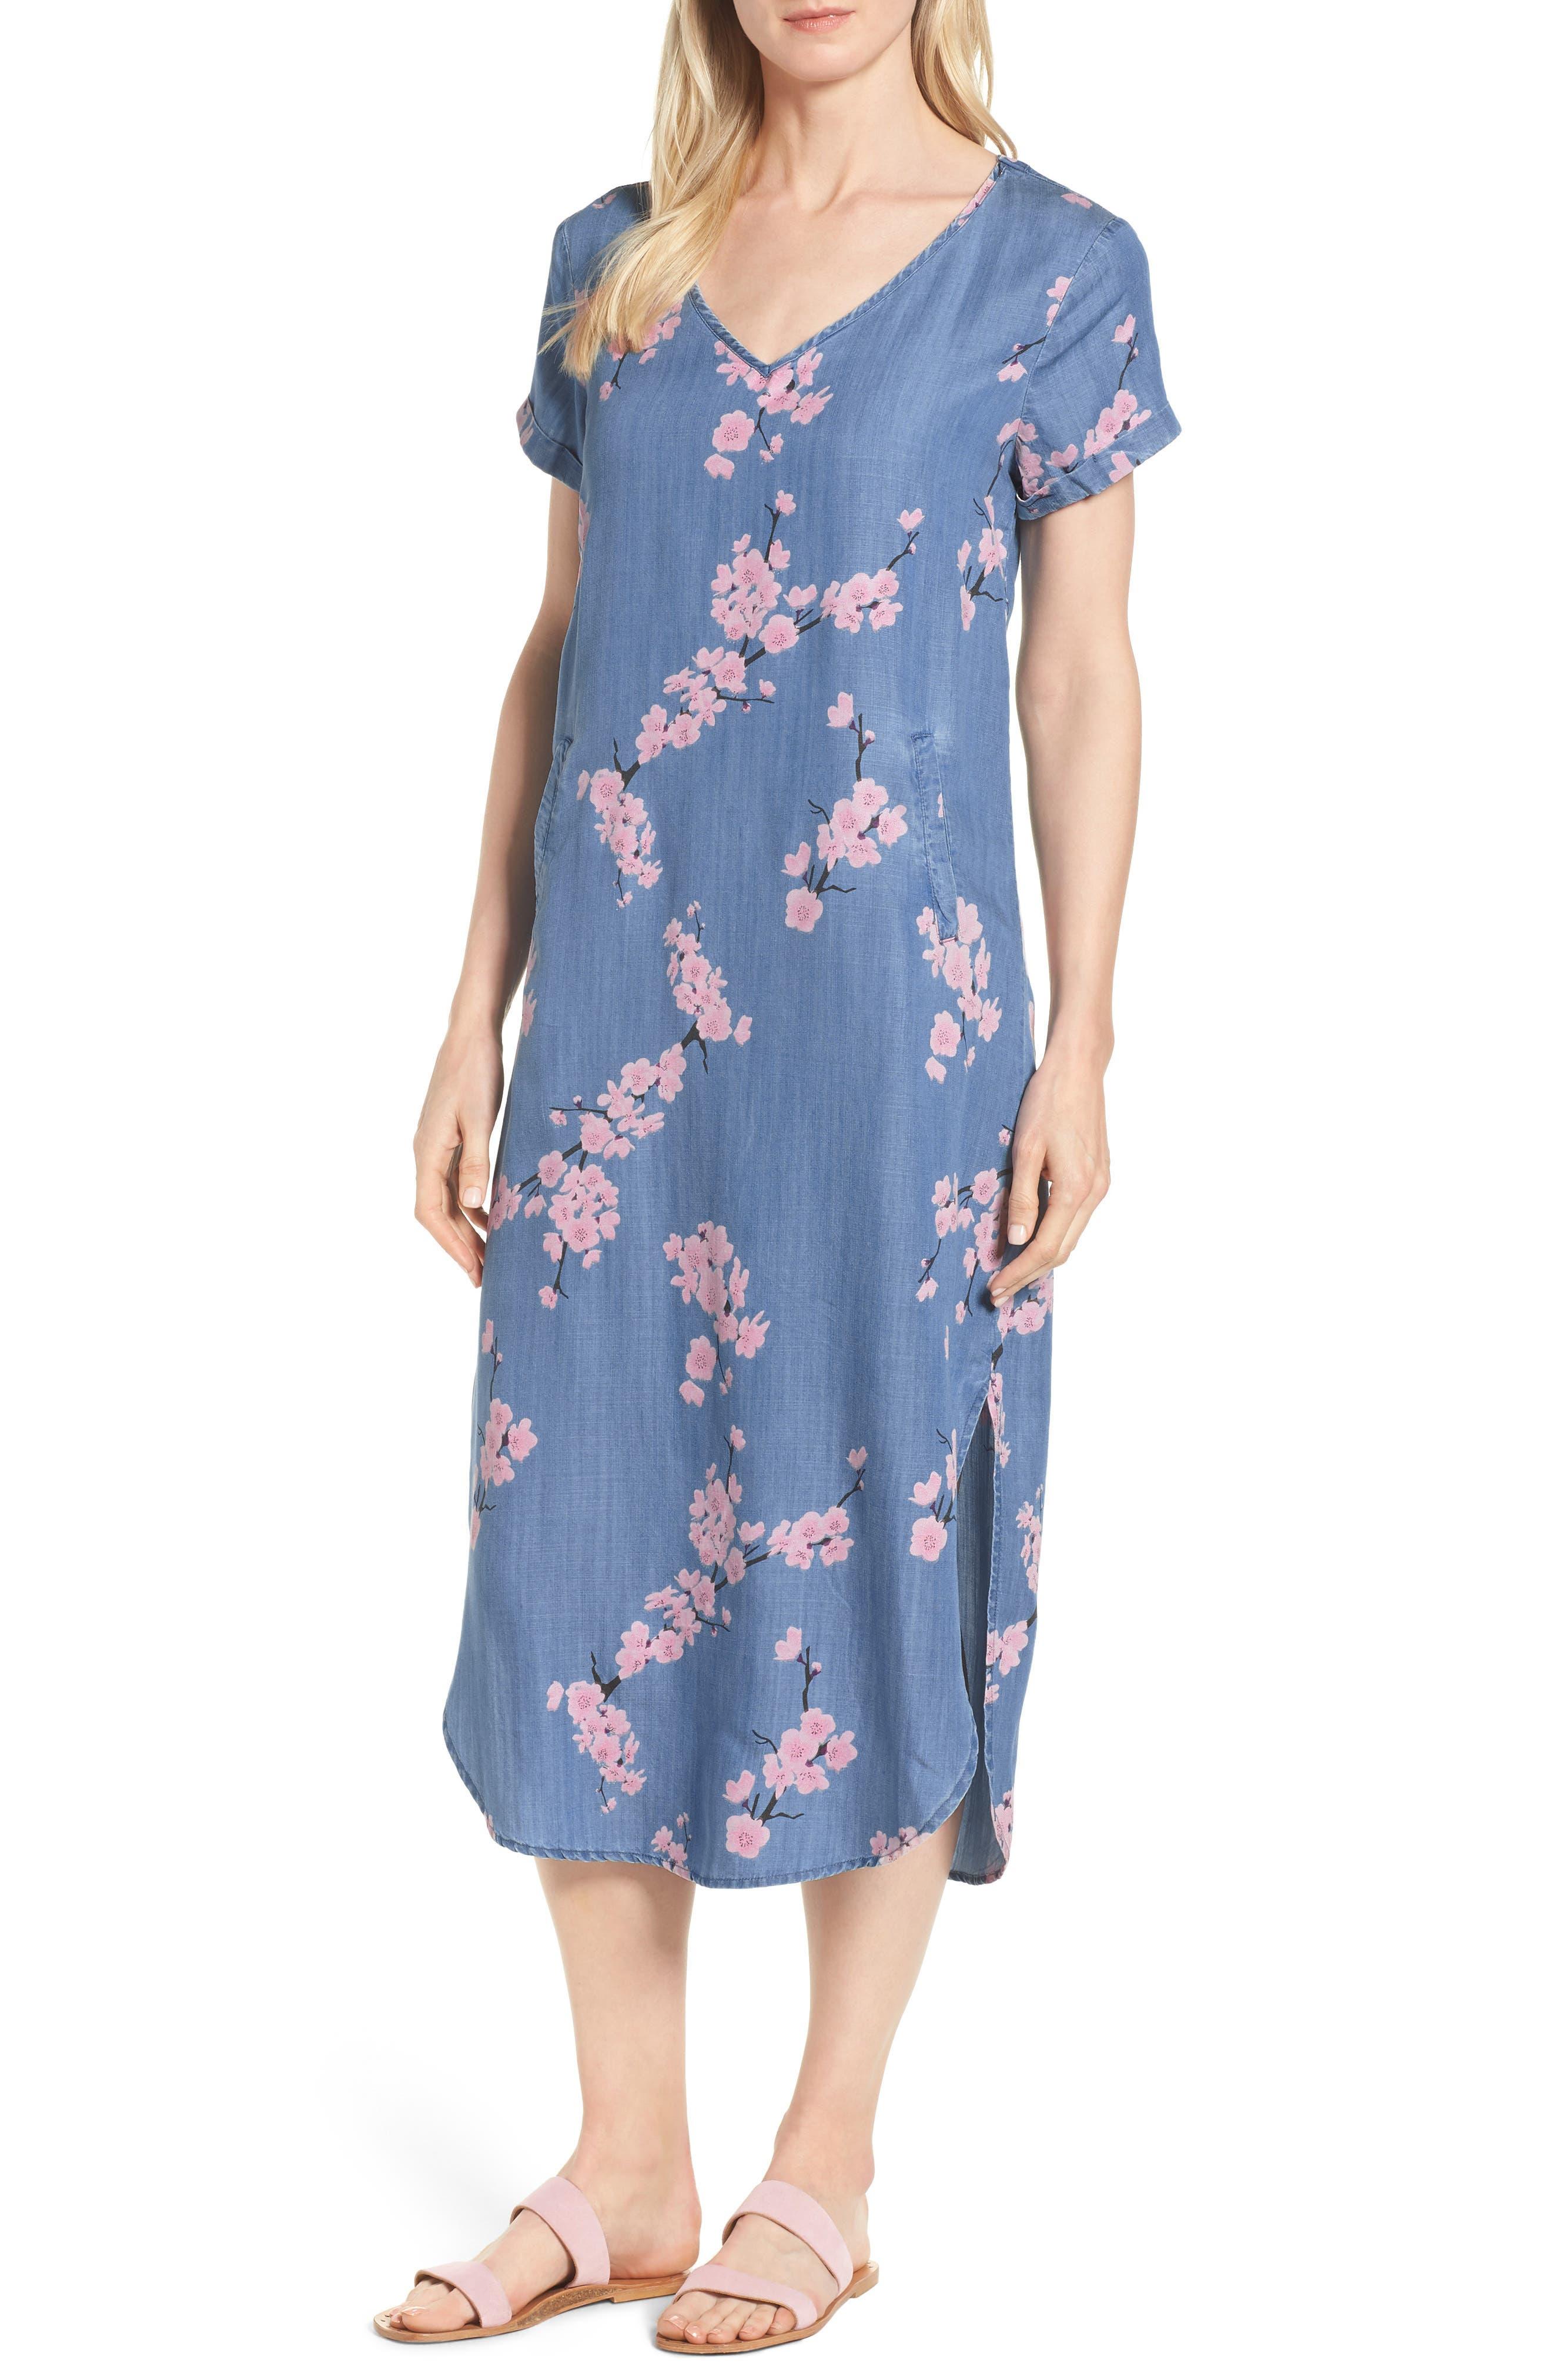 Billy T Cherry Blossom Shift Dress